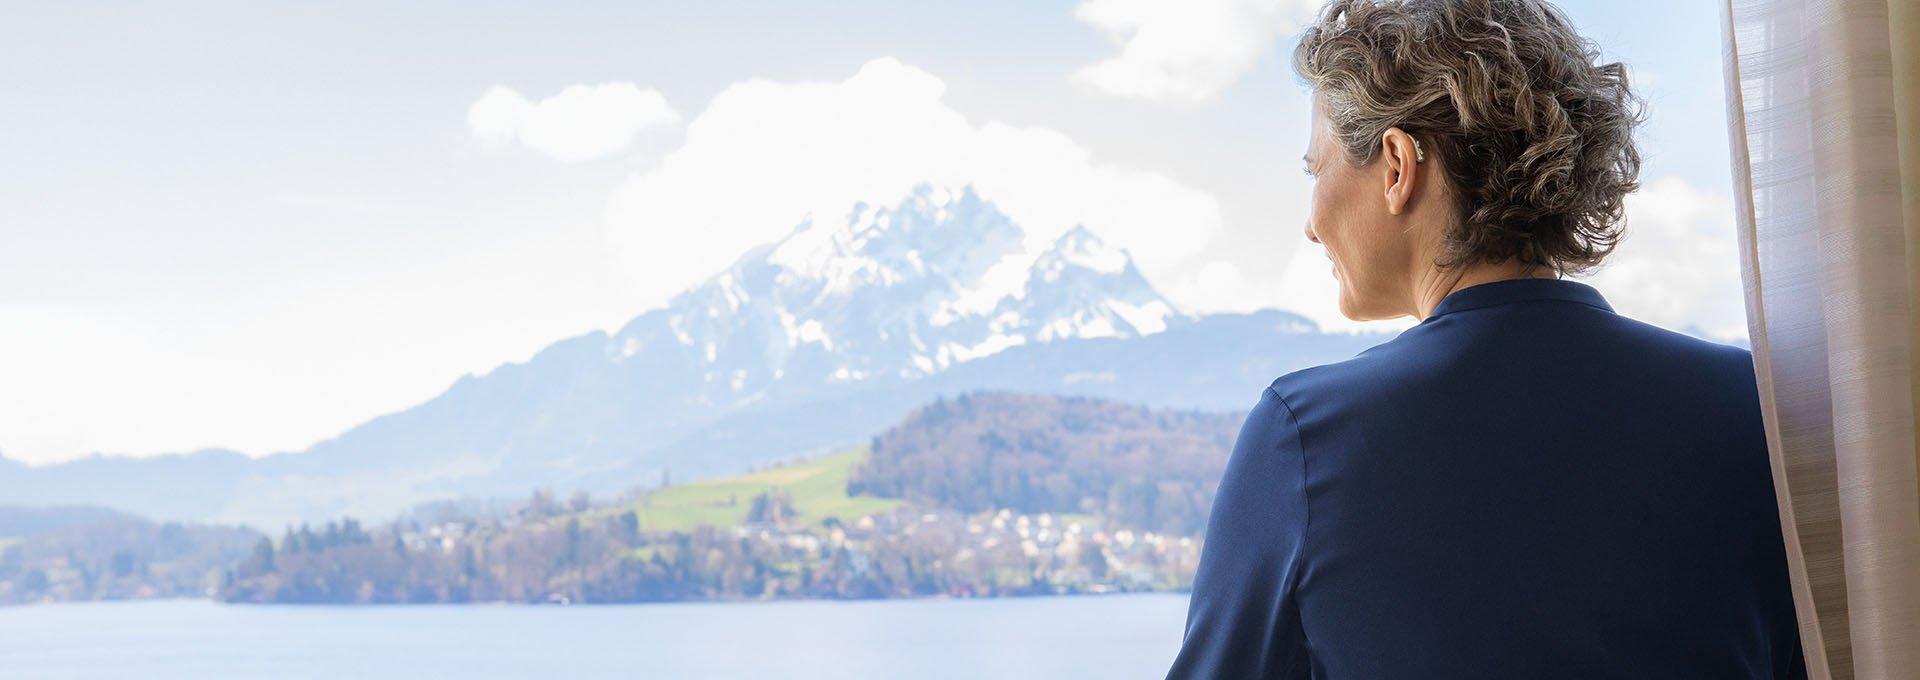 Woman wearing Bernafon Alpha rechargeable hearing aids enjoys Swiss lake and mountain view from hotel window